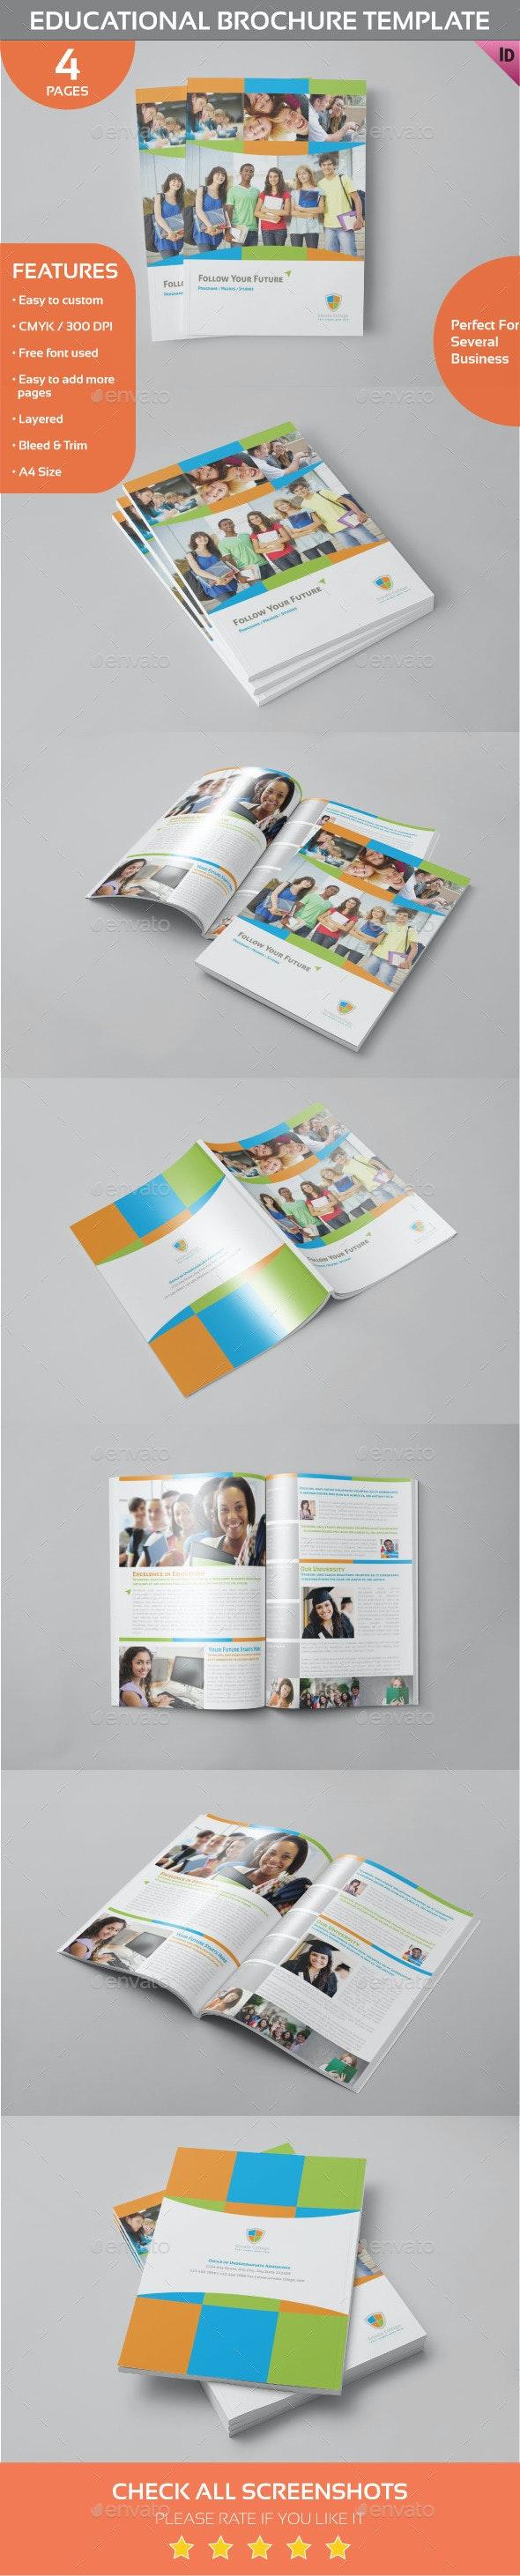 Educational Brochure Template - Informational Brochures